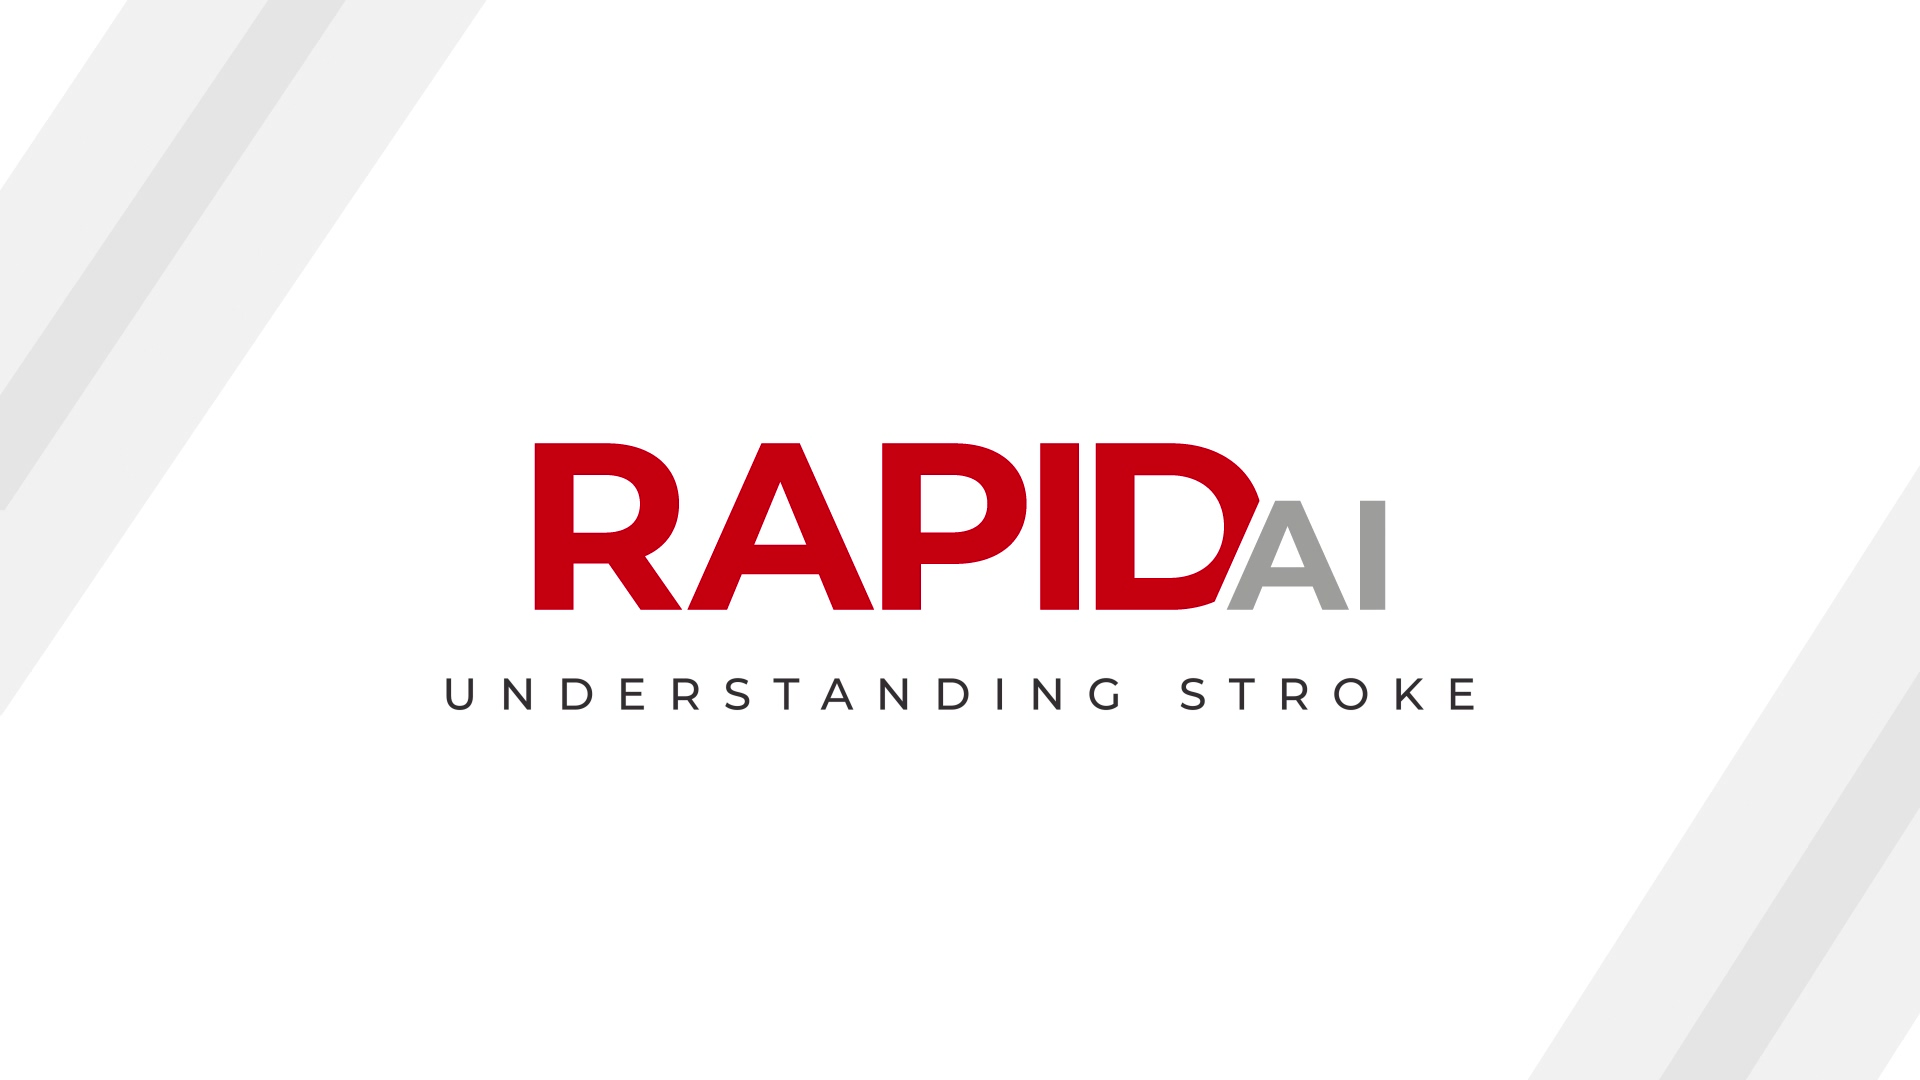 RAPID Understanding Stroke-v6